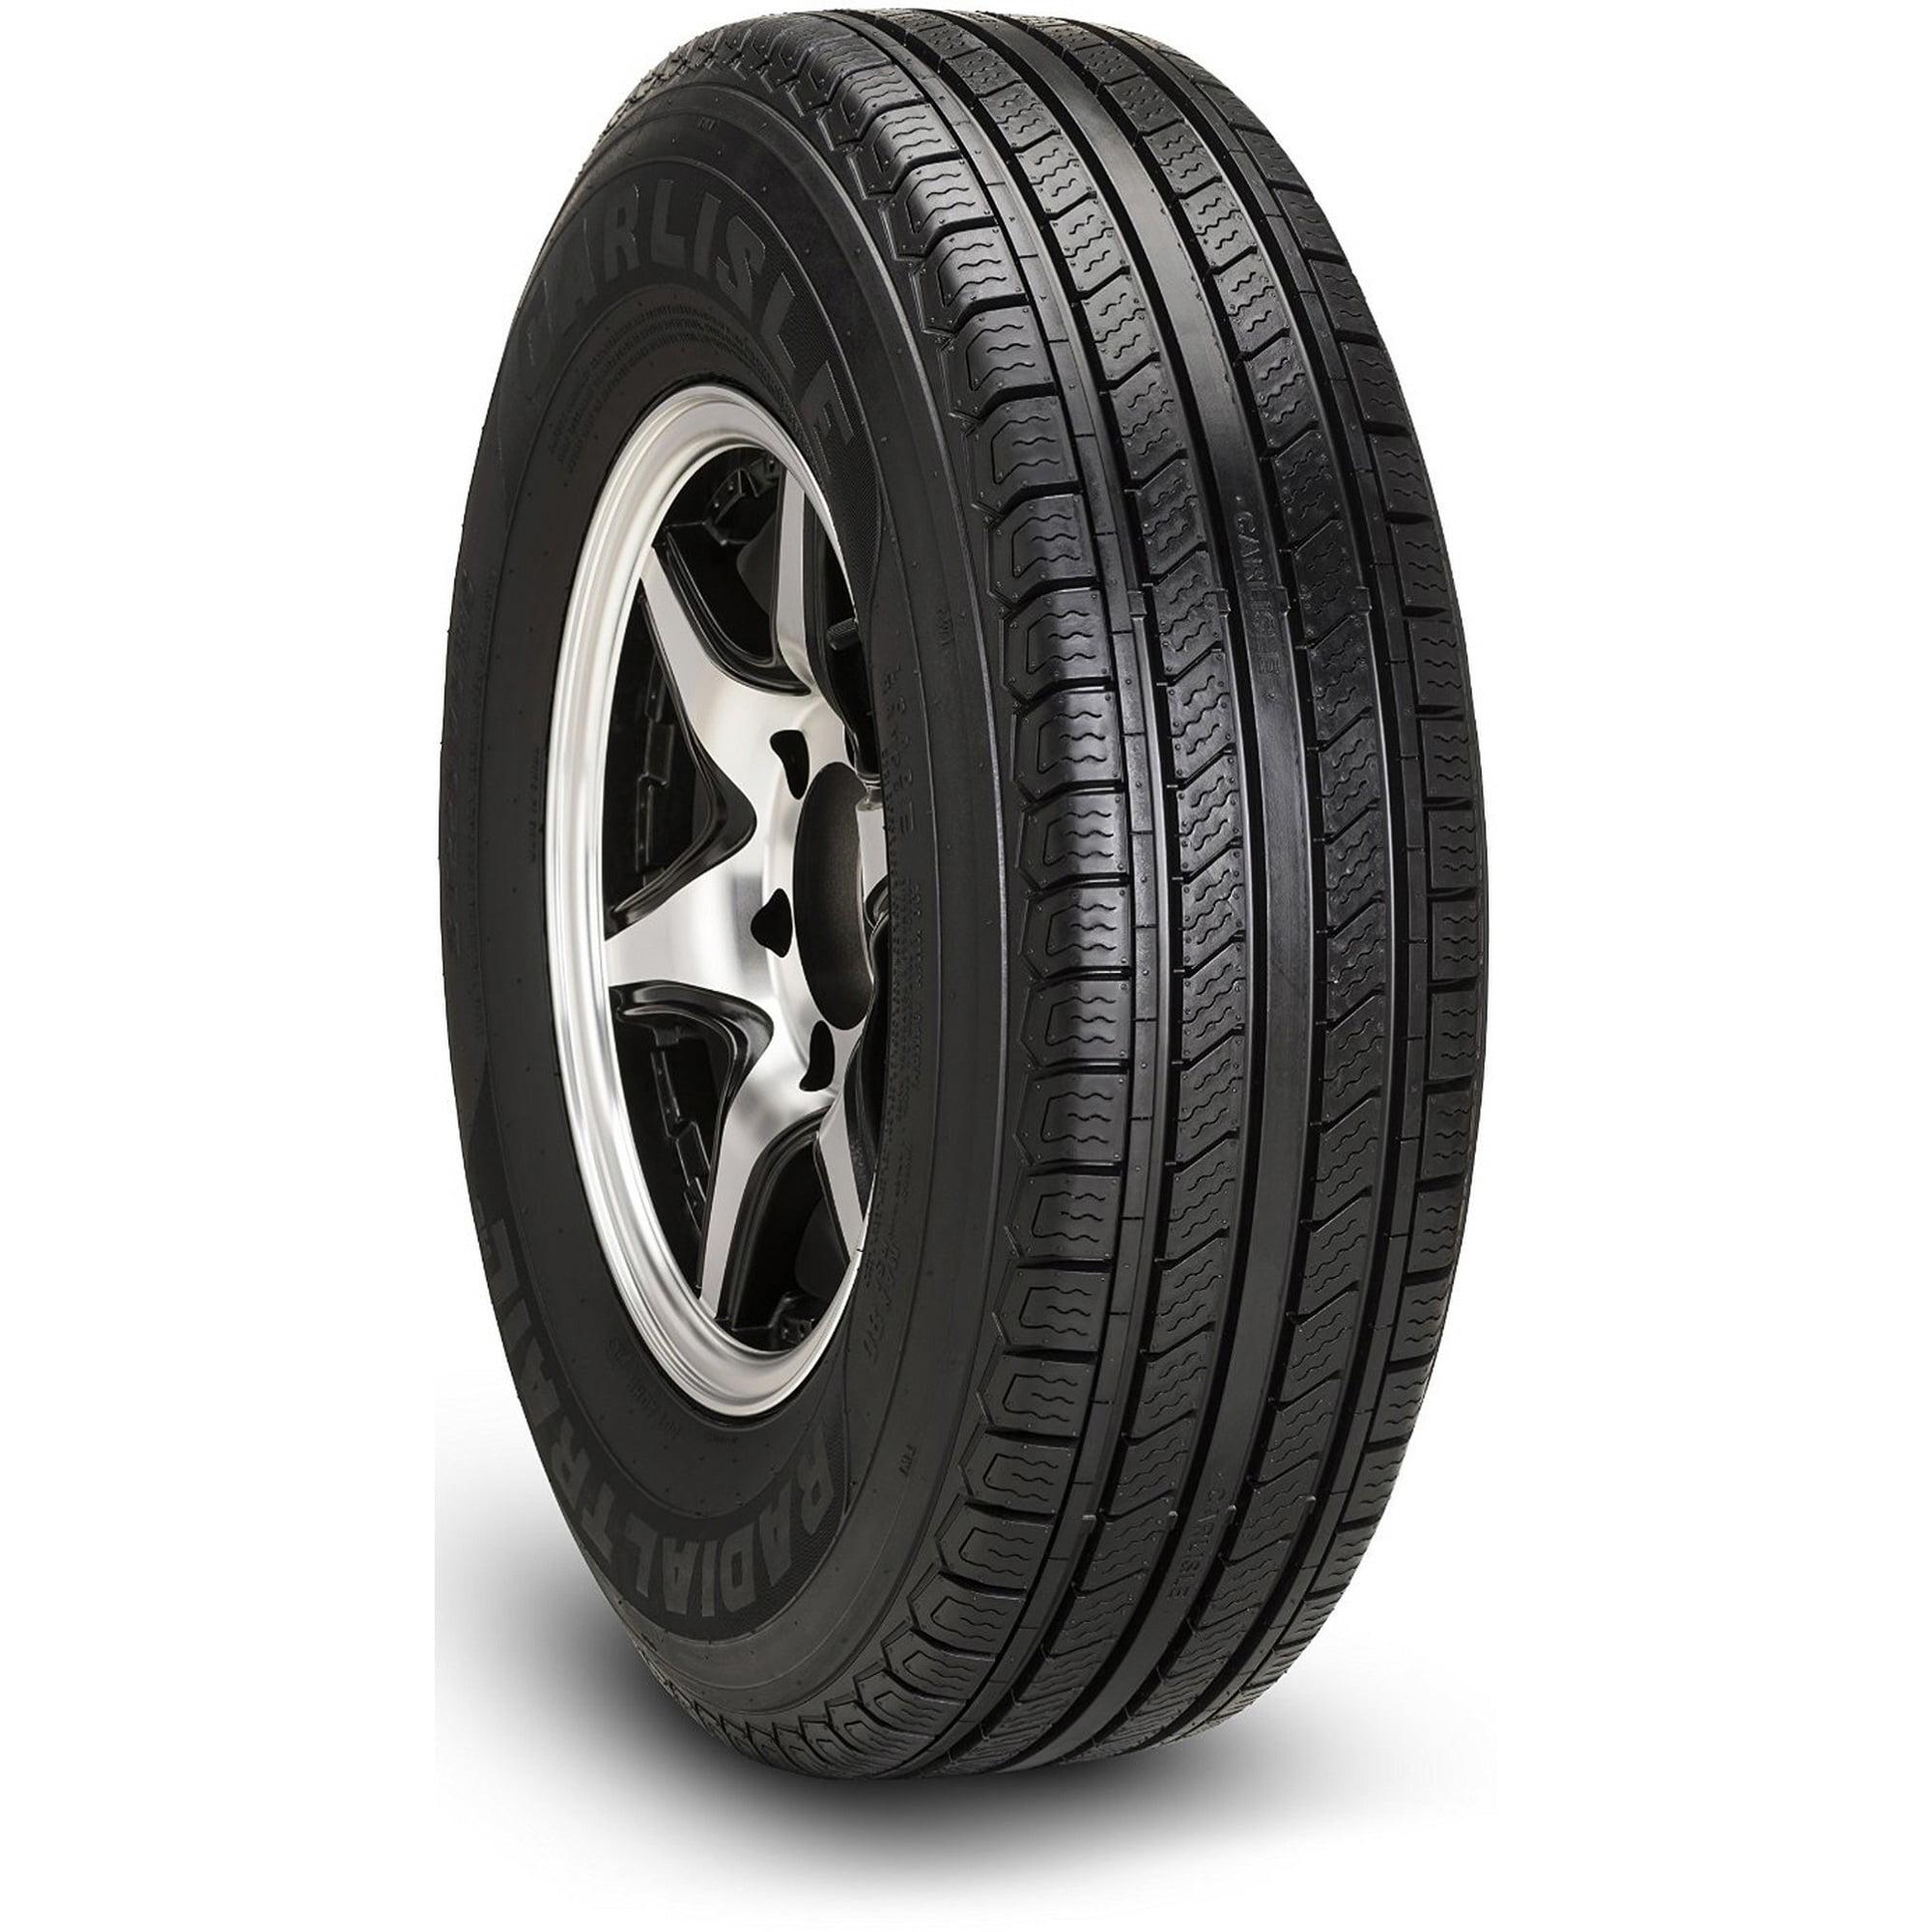 235 85r16 Trailer Tires >> Carlisle Radial Trail Hd Trailer Tire St235 85r16 F 12 Walmart Com